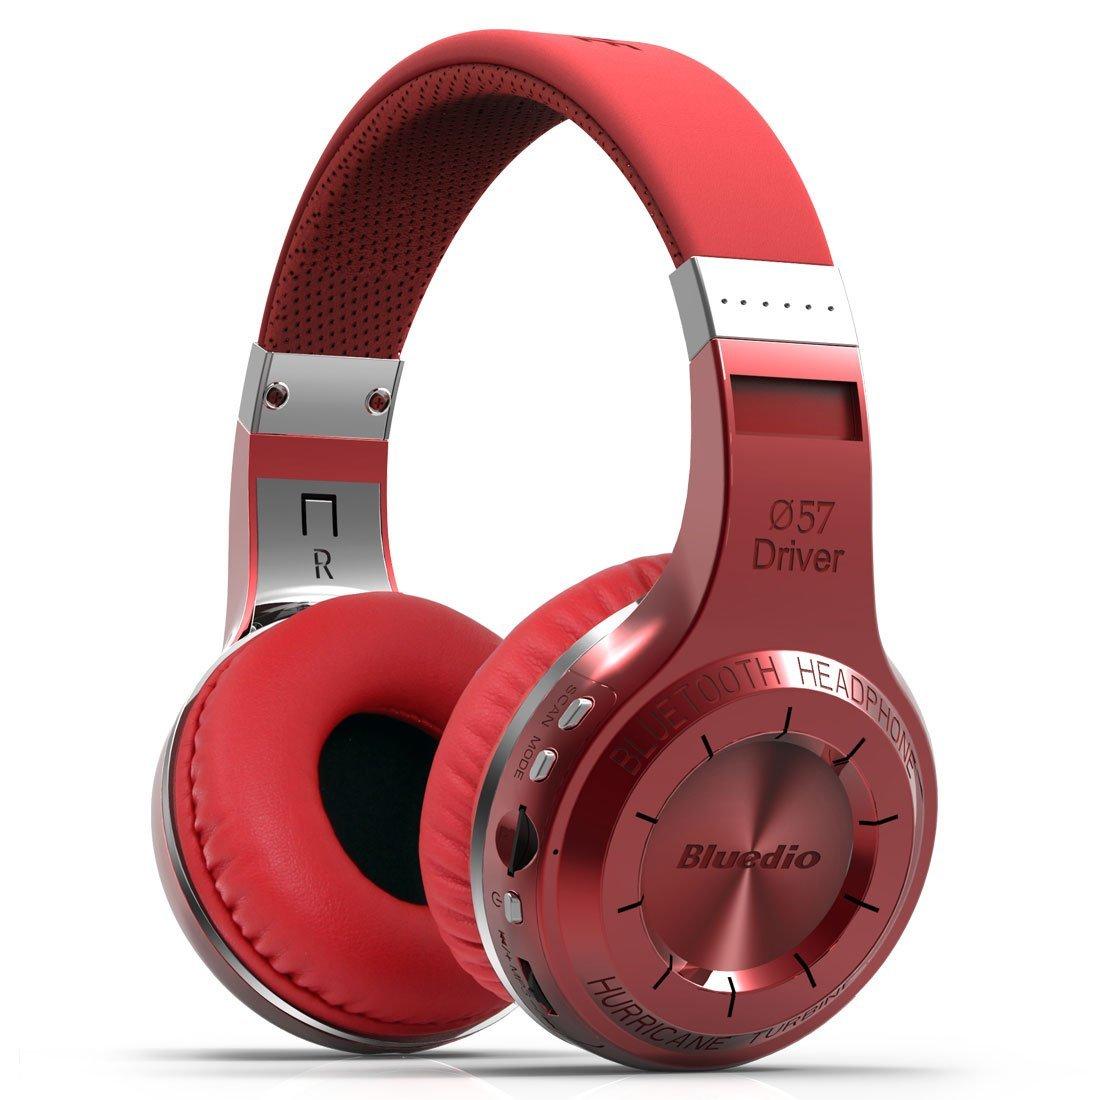 Bluedio Hurricane Headphone Review